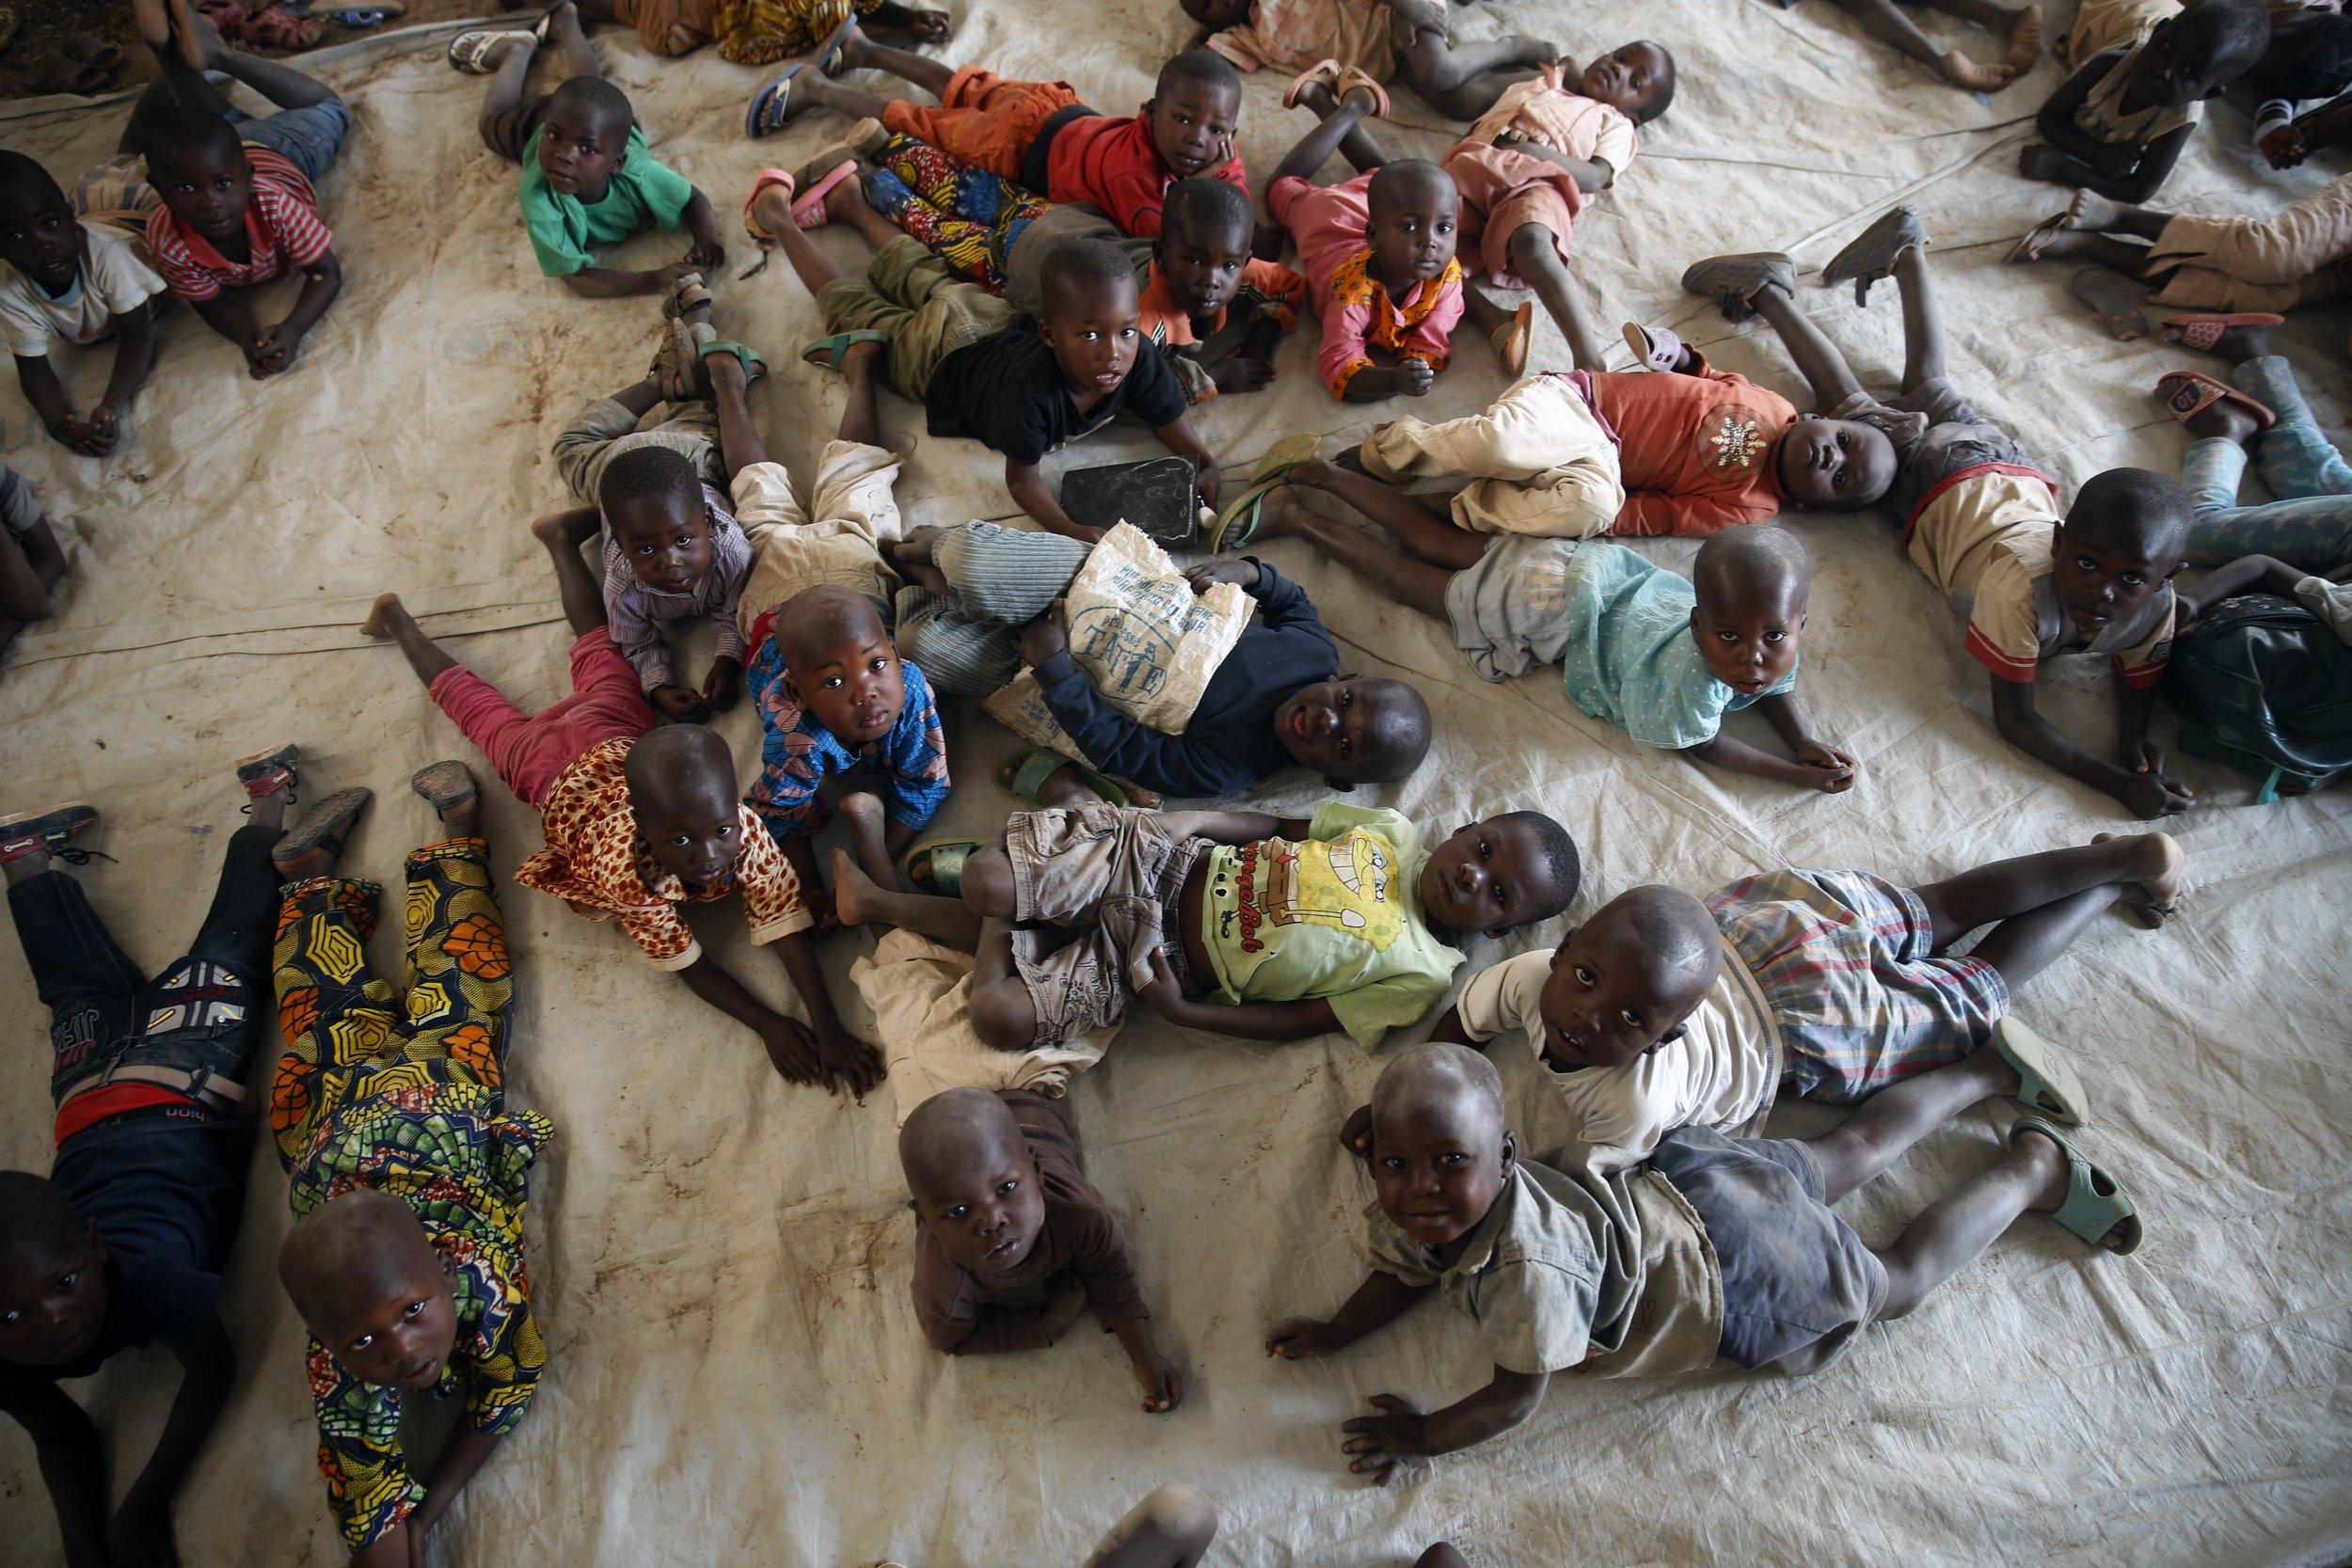 Inside the World of Bangui's Traumatized Street Children